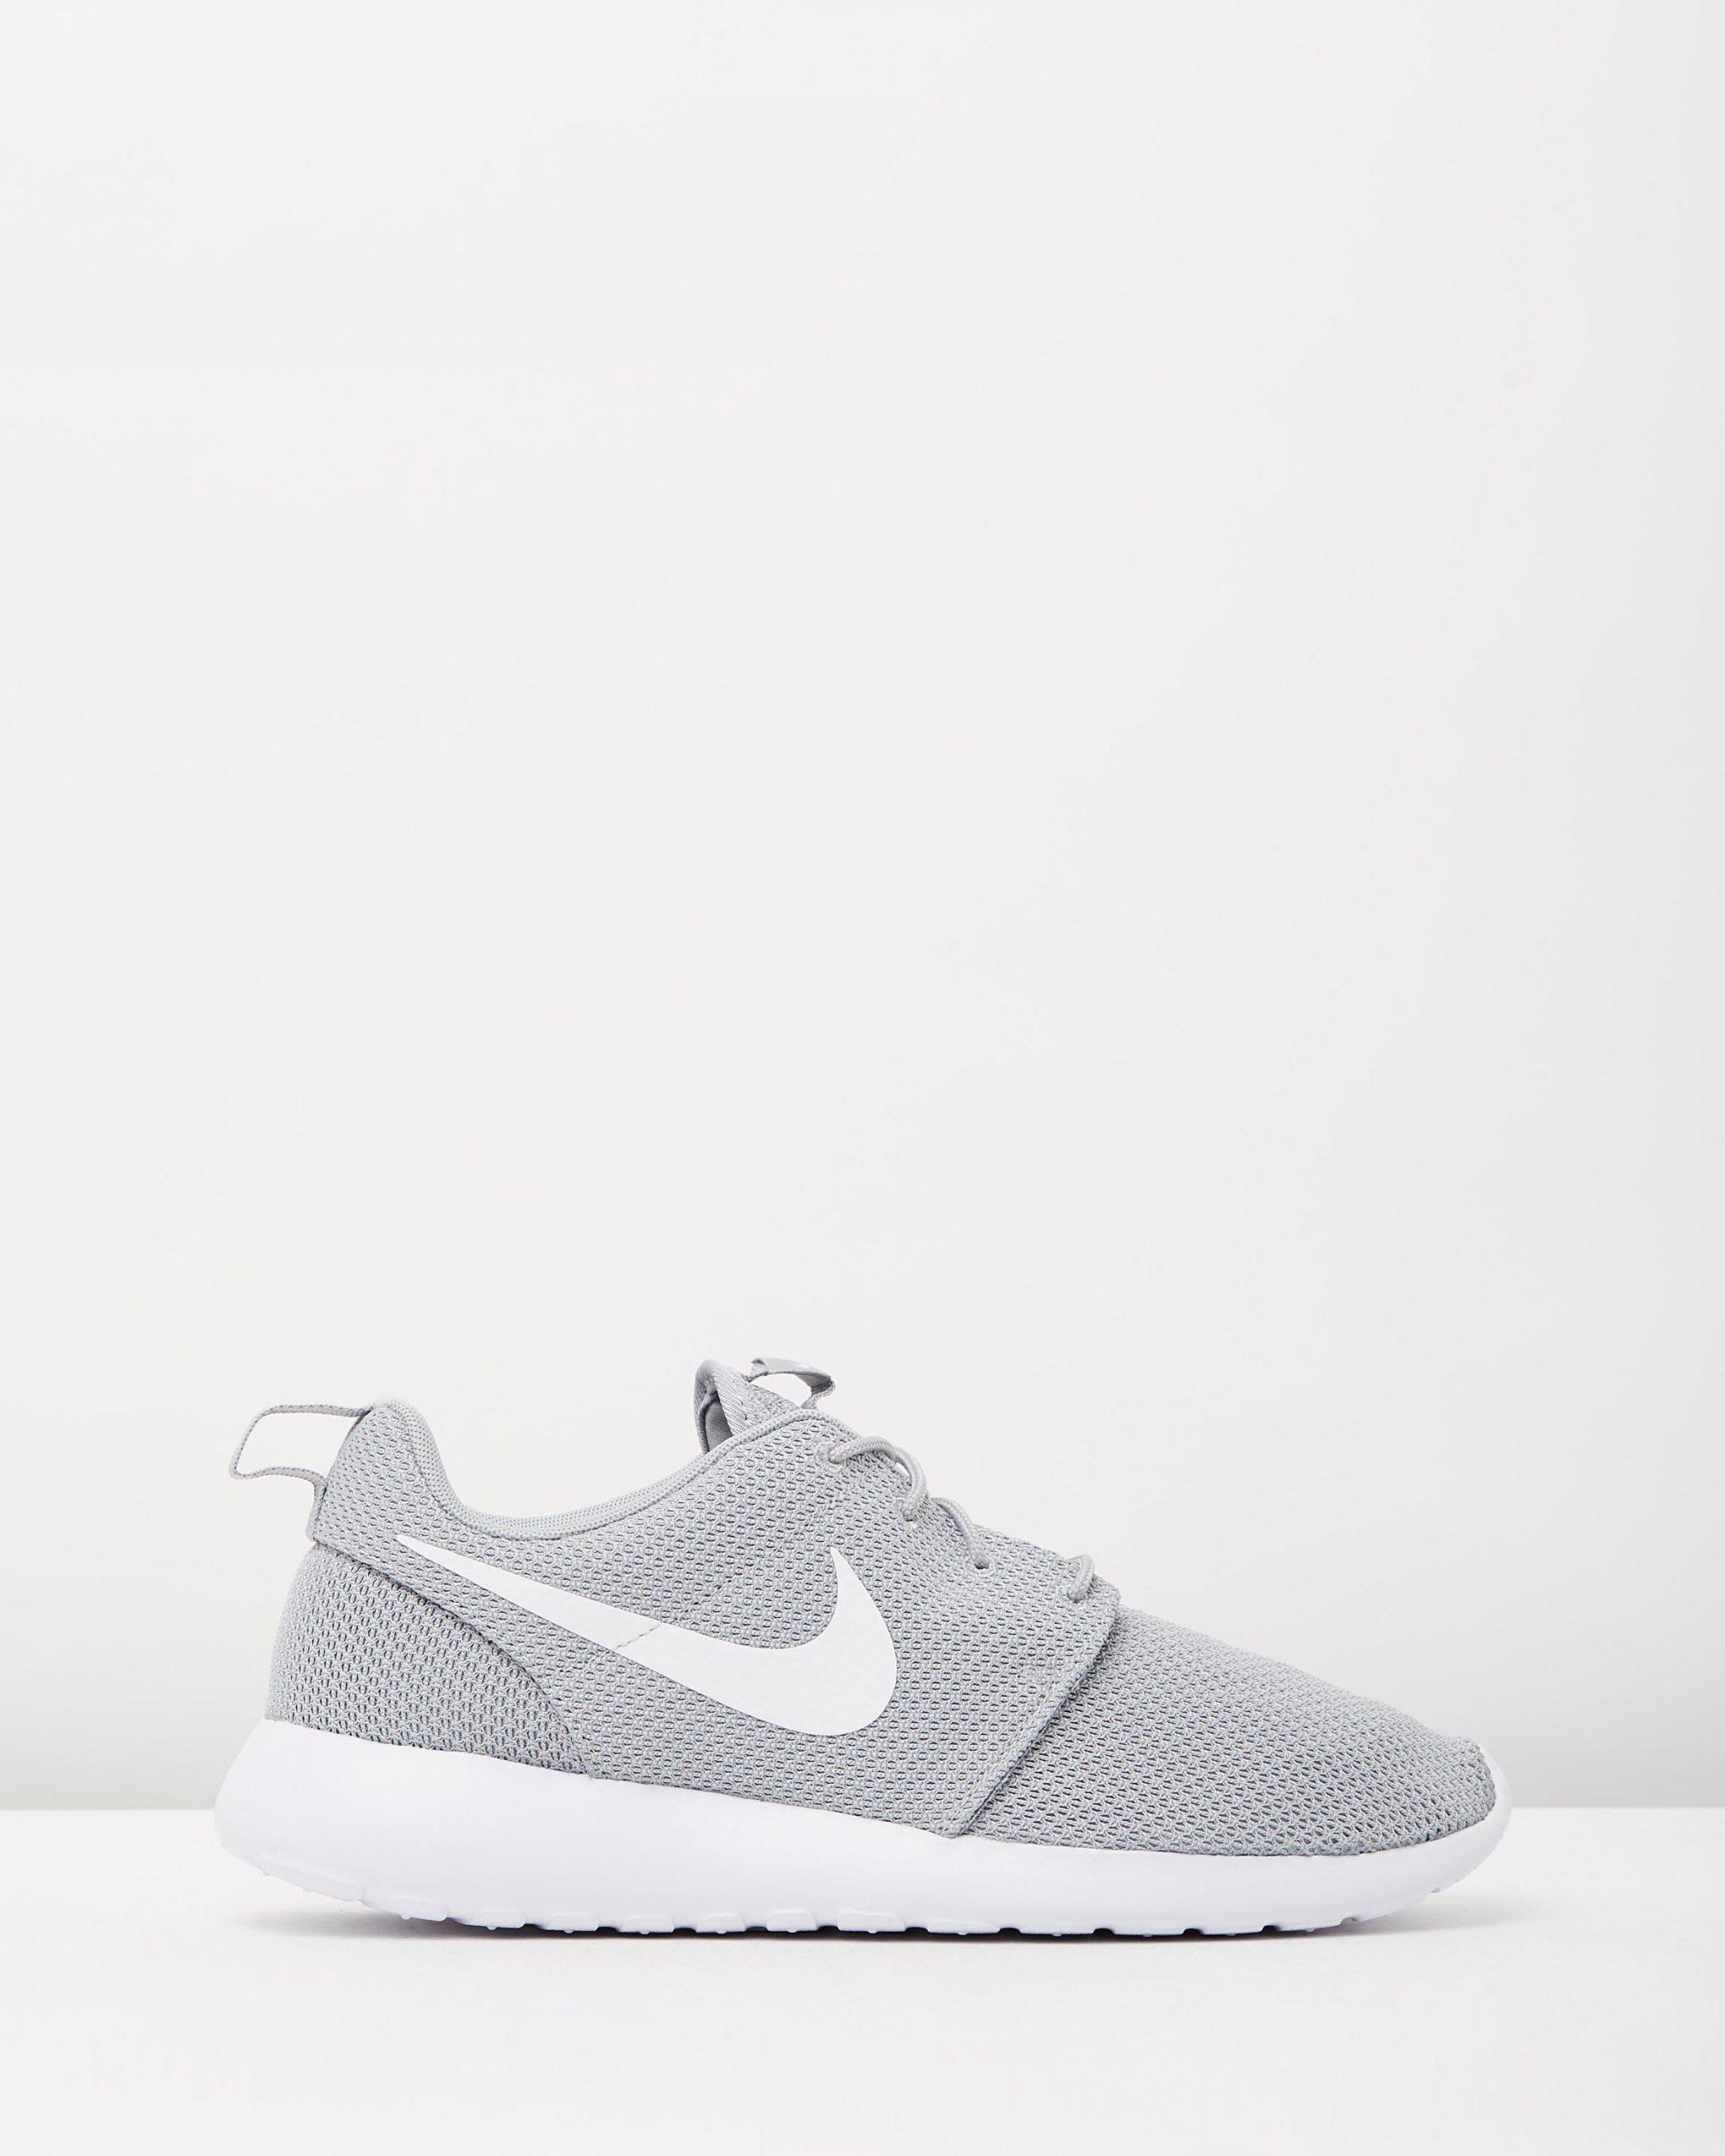 Nike Mens Roshe One Wolf Grey & White